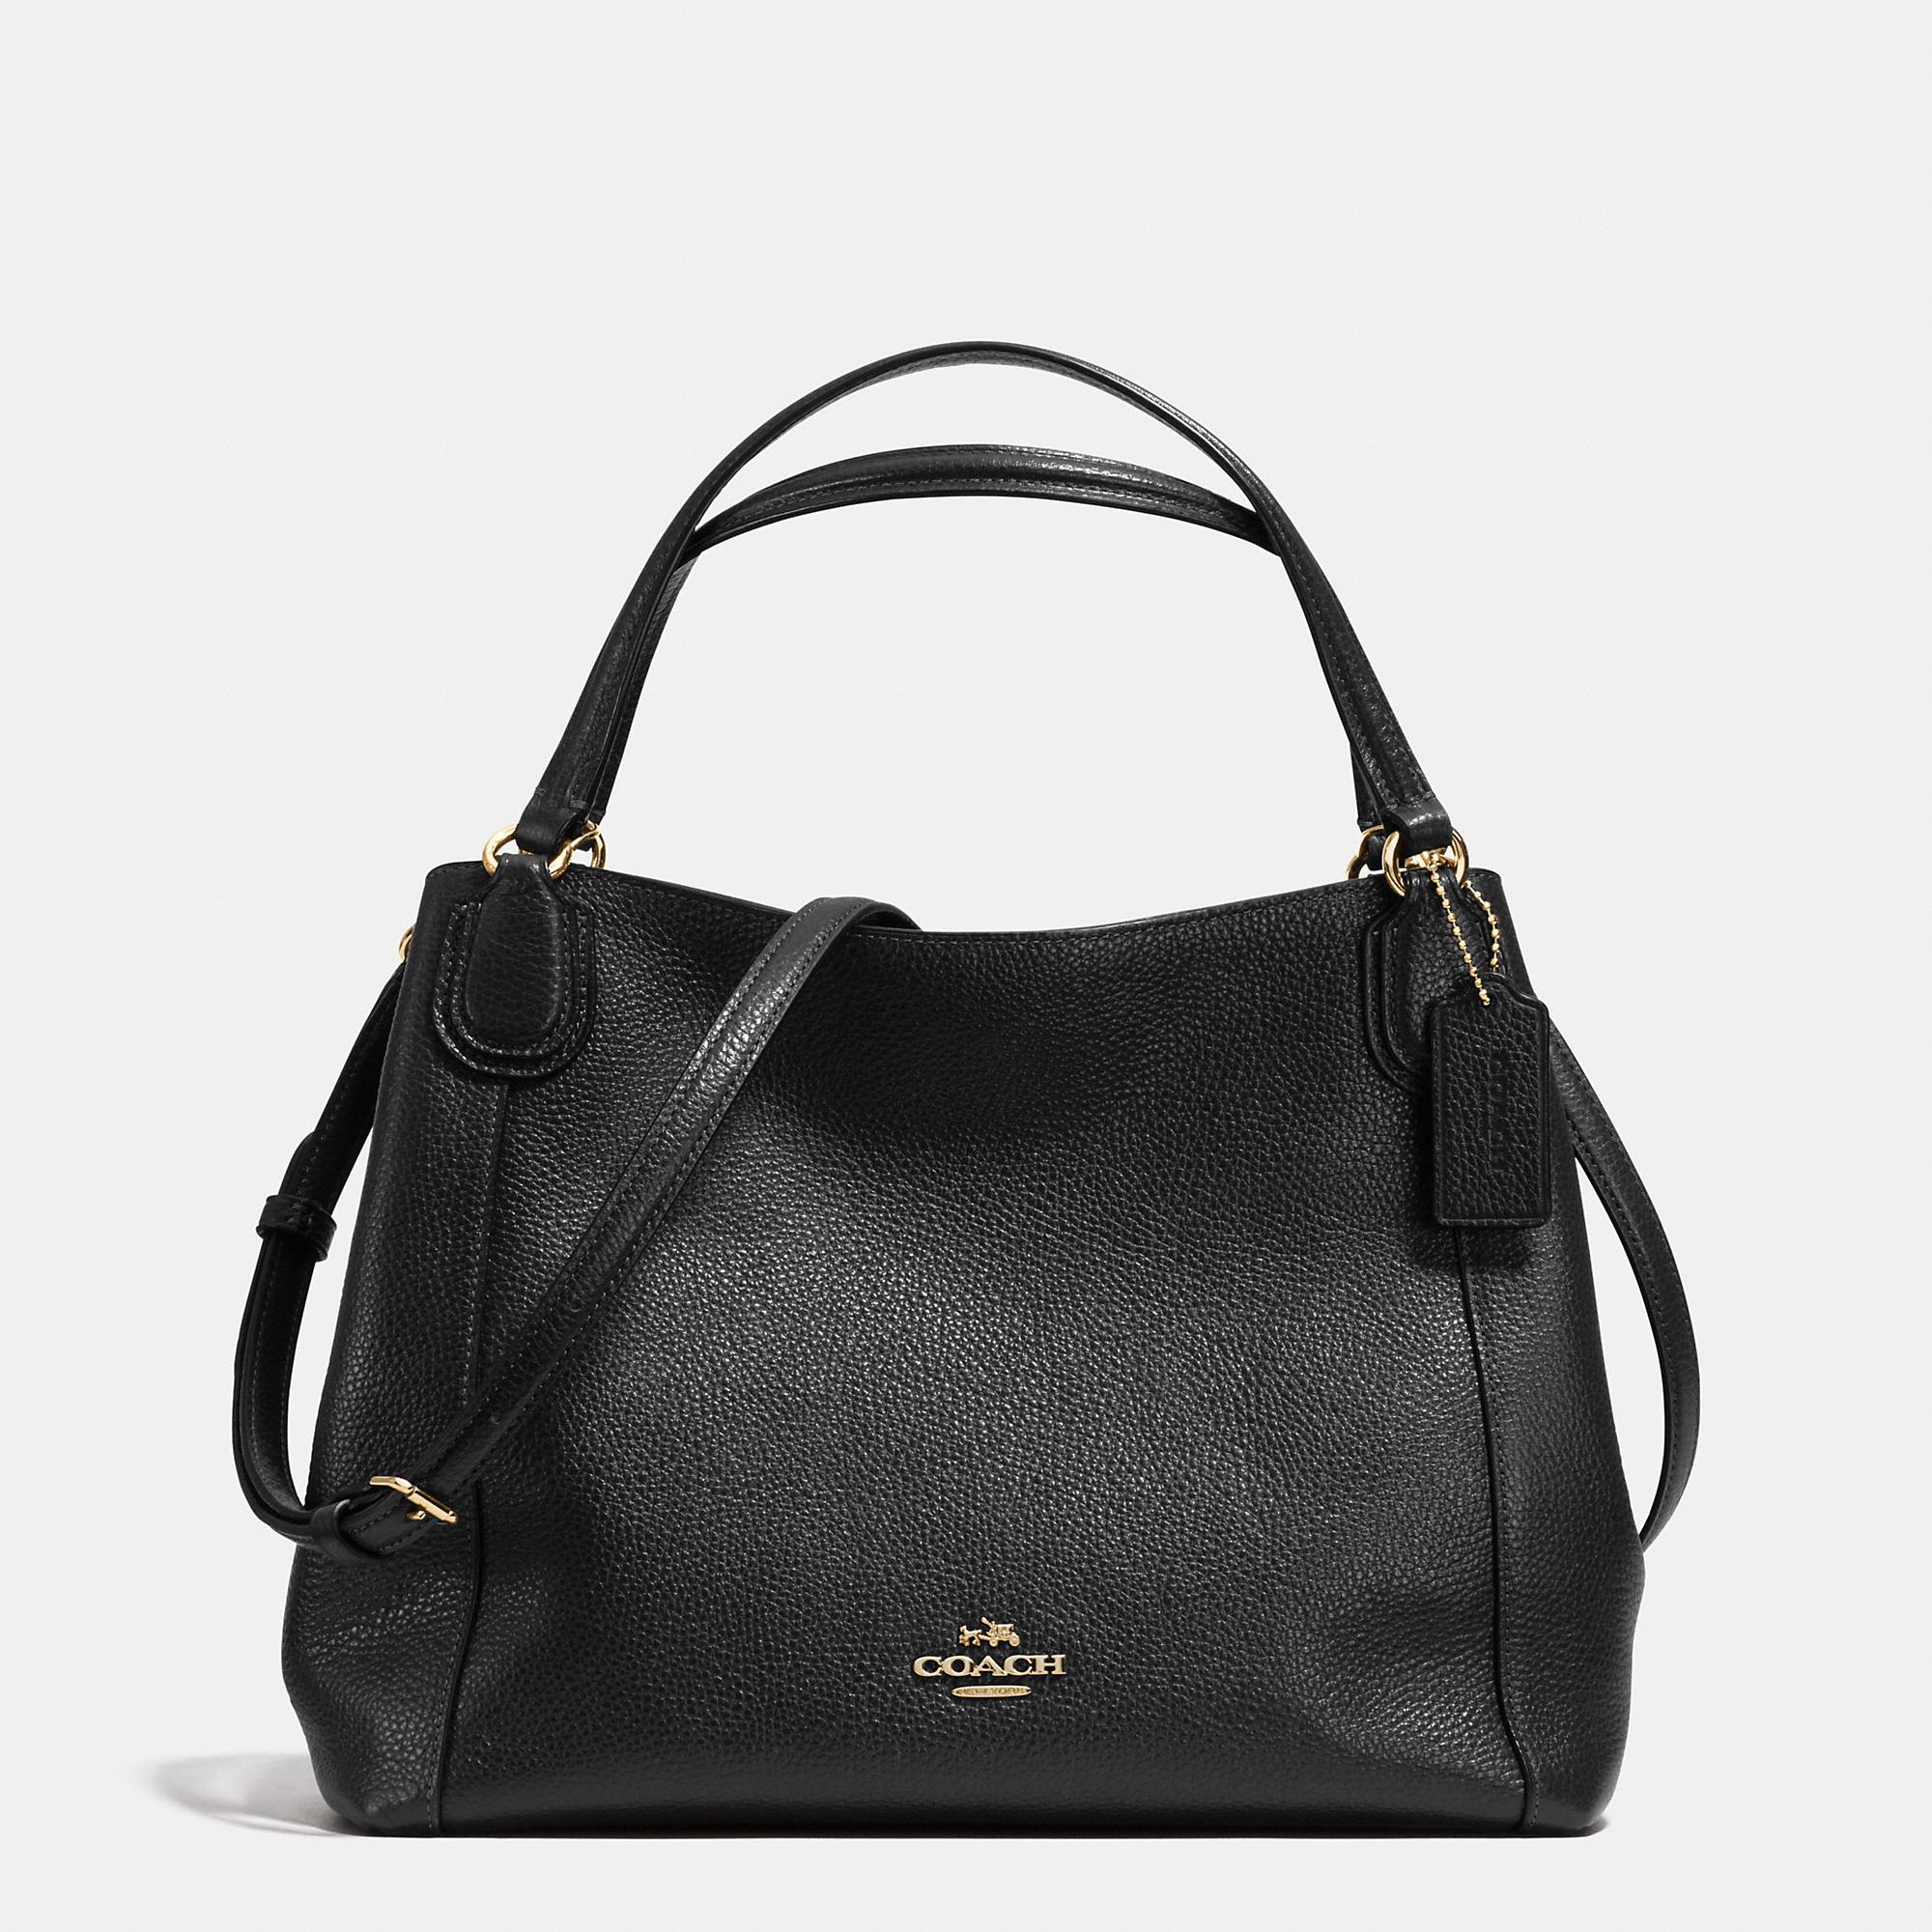 COACH Edie 28 Leather Shoulder Bag in Black - Lyst